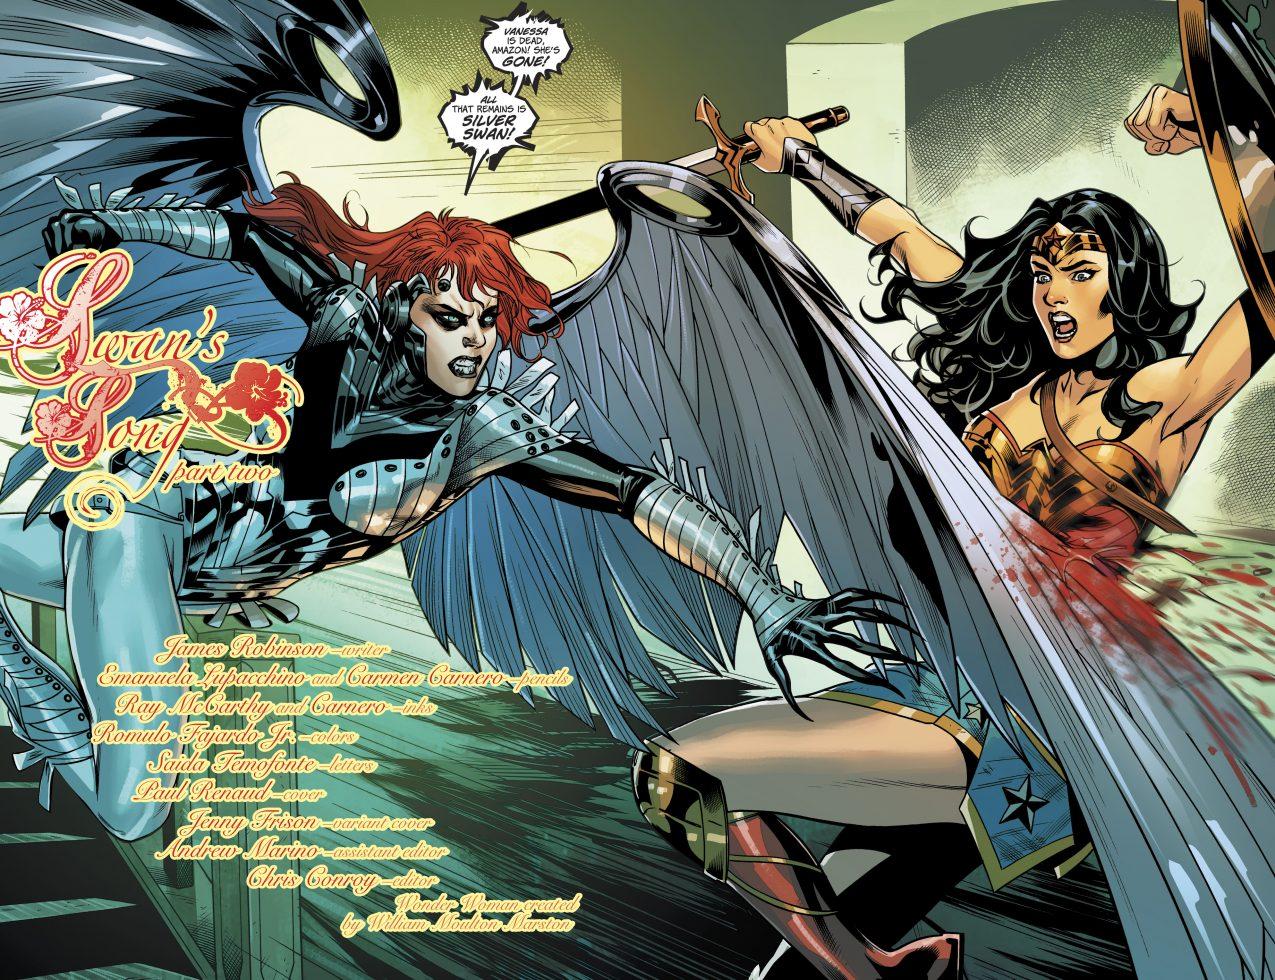 Wolverine vs wonder woman Part 6